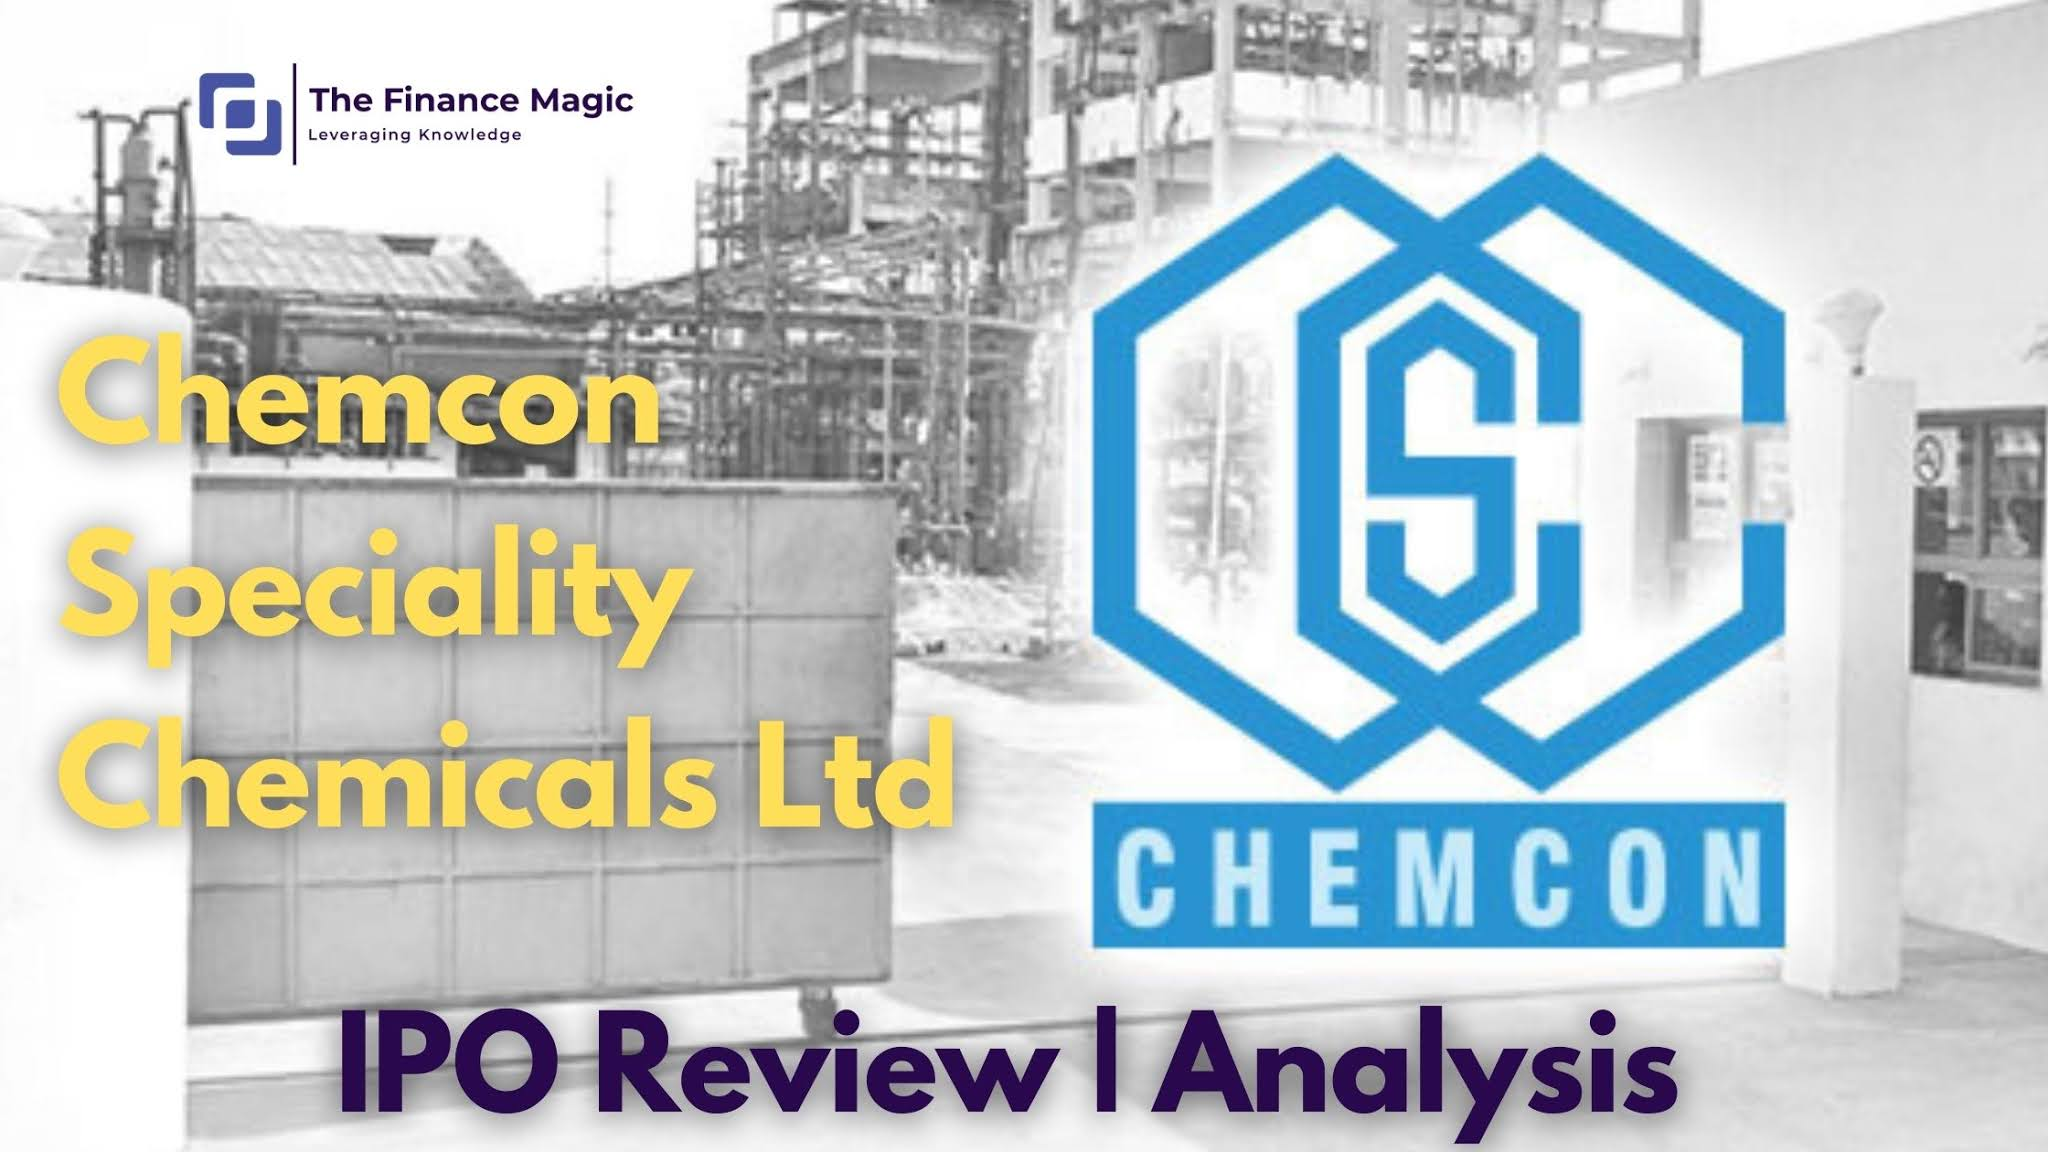 Chemcon Speciality Chemicals Ltd - Company analysis